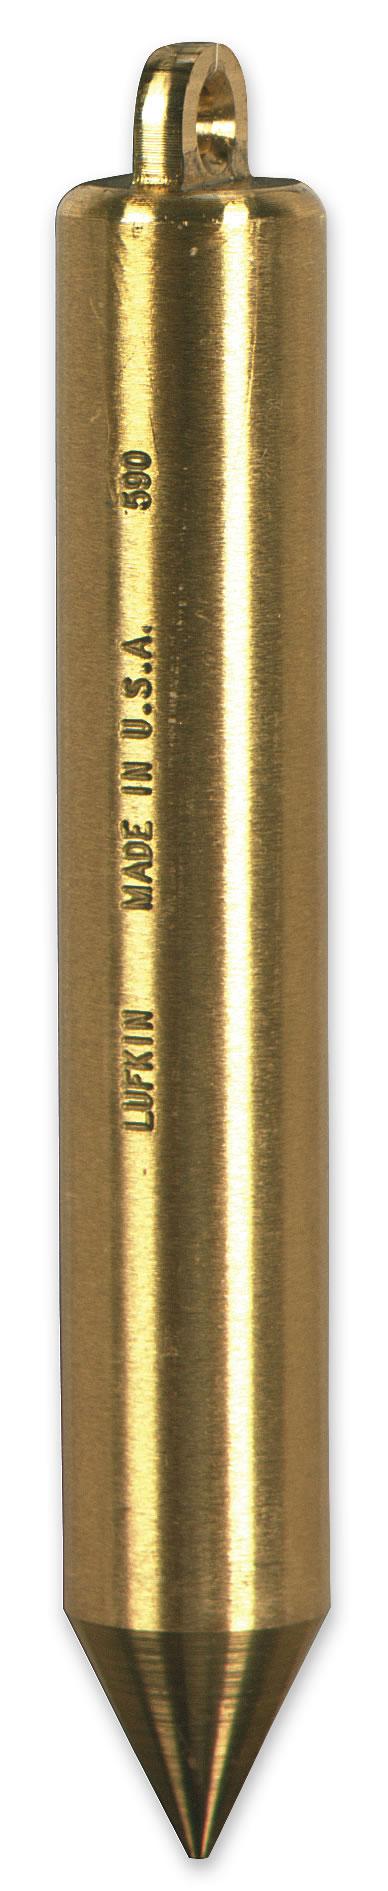 20 Oz Plumb Bob Solid Brass Inage Cylindrical Shape 590